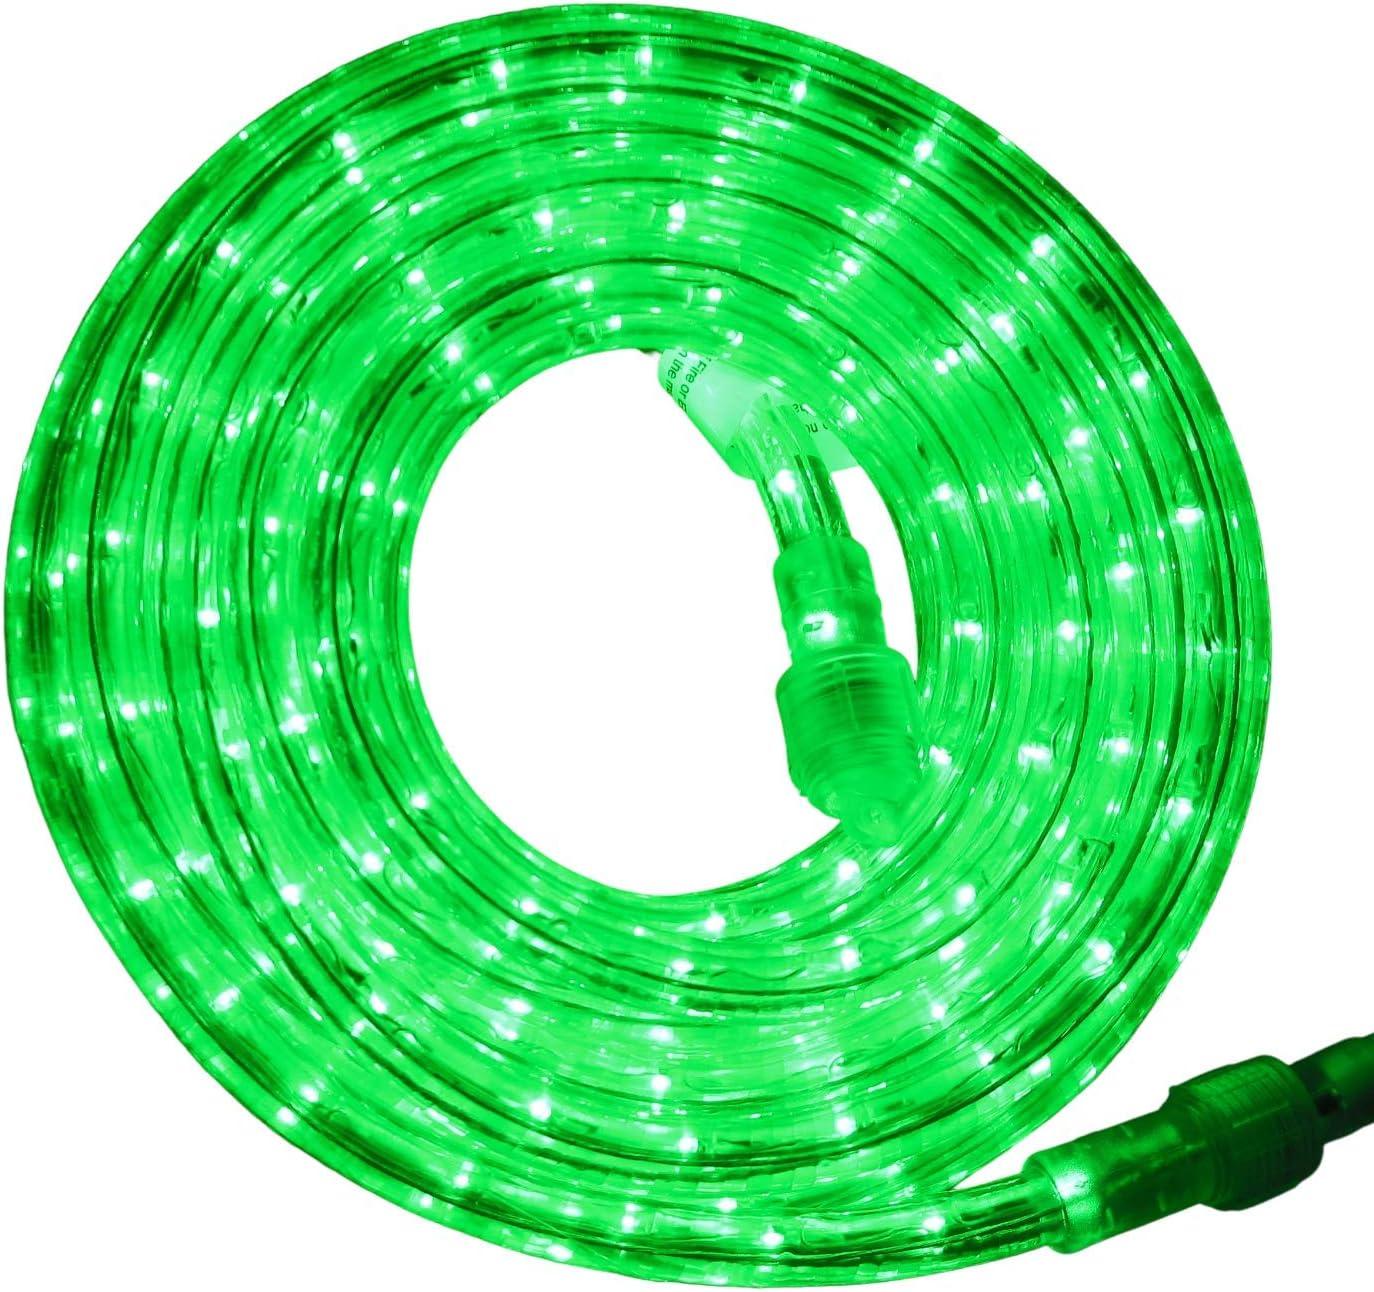 "Flexilight LED Rope Light Max 51% OFF 110V - 120V 2"" 1 2-Wire Arlington Mall Diameter"